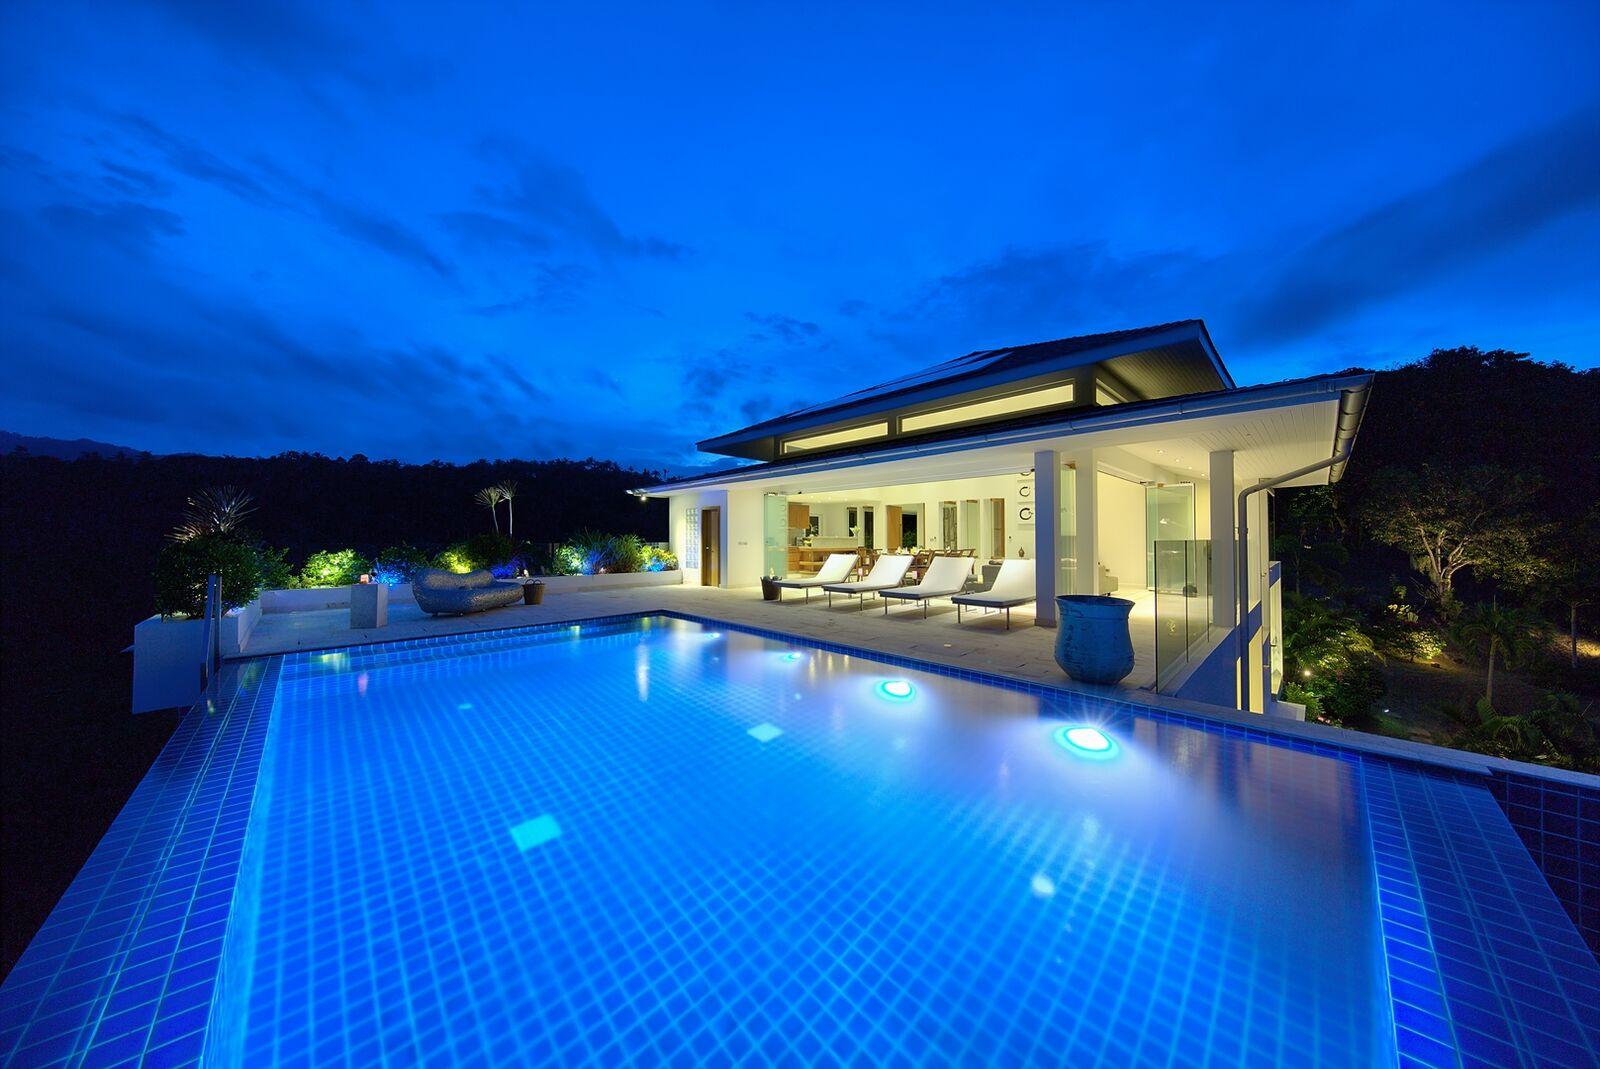 2 Bedroom Option Sea View Villa with Private Pool at Bophut Hills Ko Samui